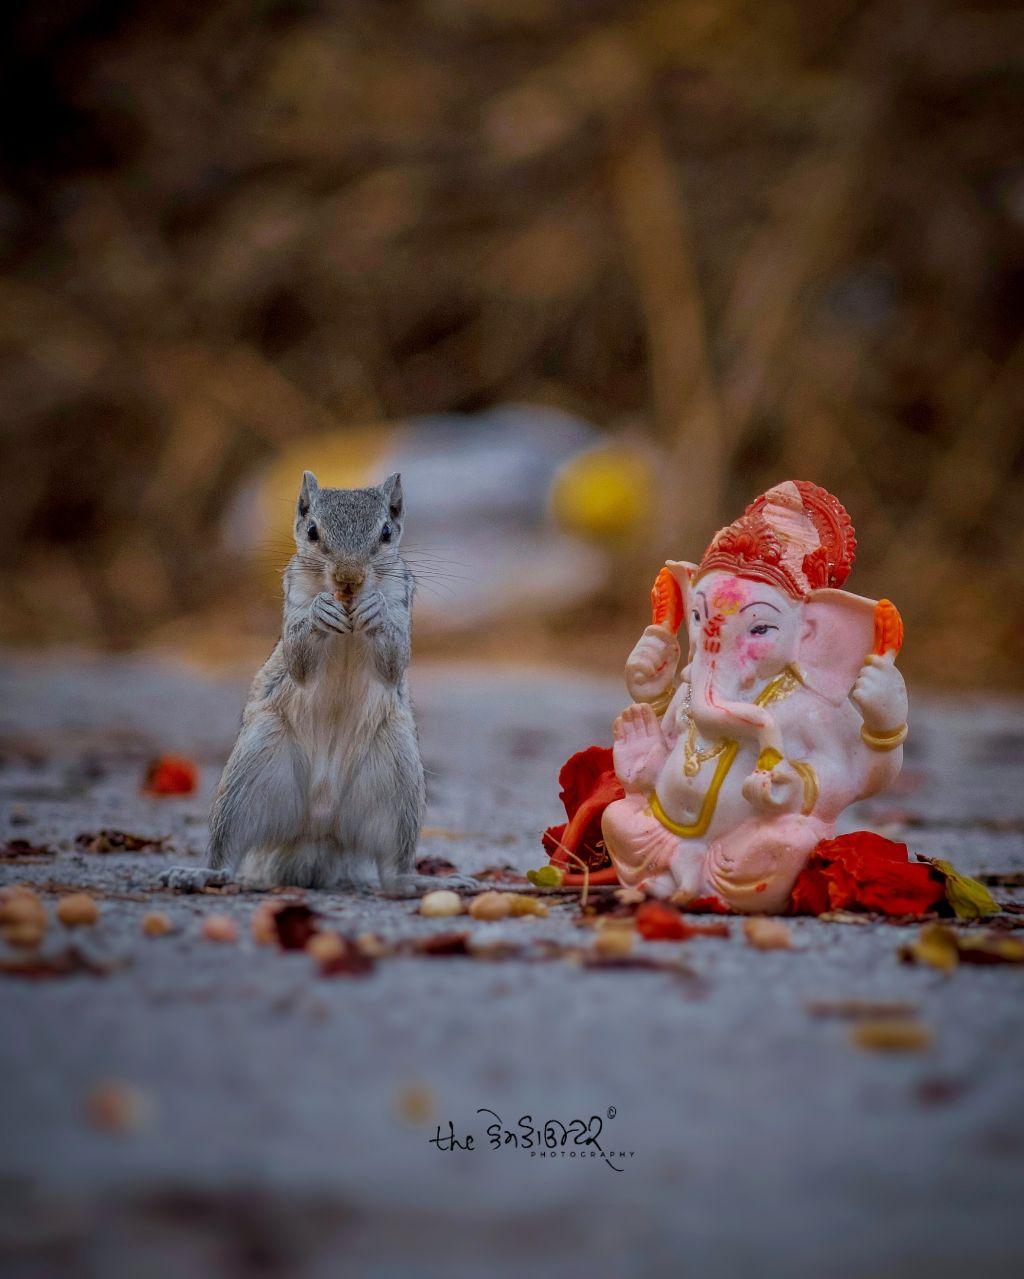 Agale baras tu jaldi aa #ganesha  #camcounter #photography #picsart @picsart